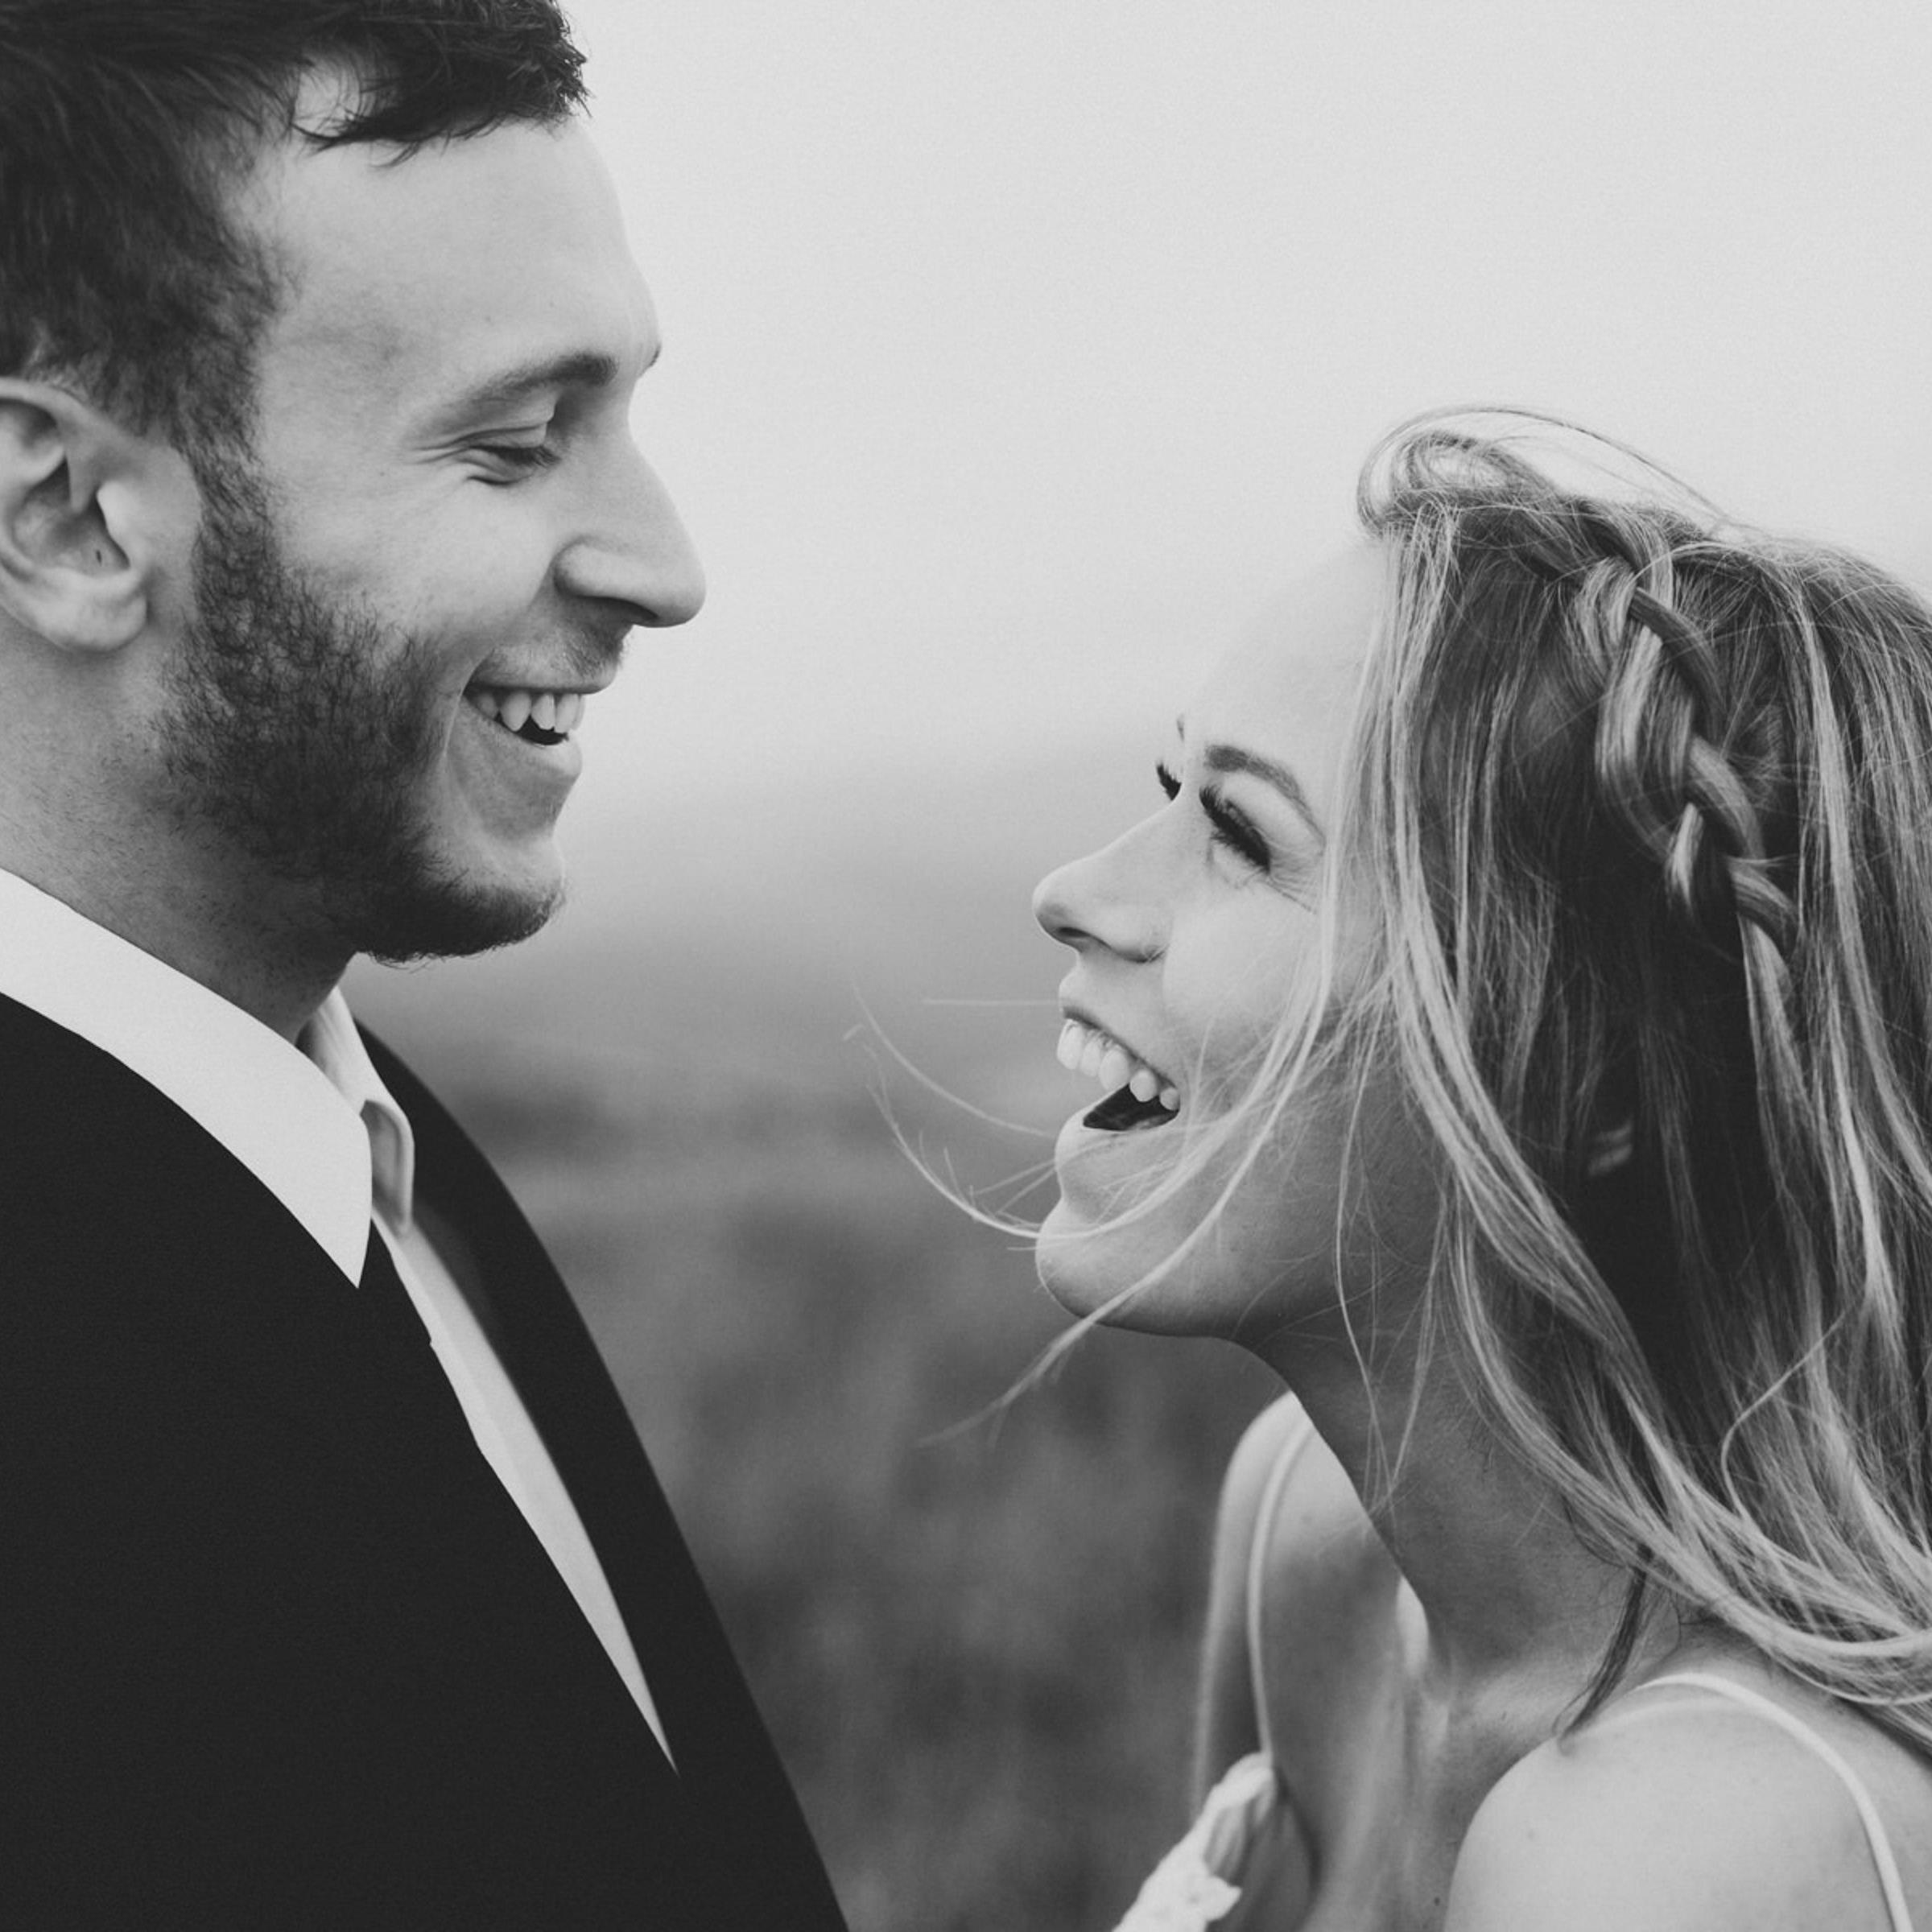 Amelia_Fletcher_weddings-78.jpg